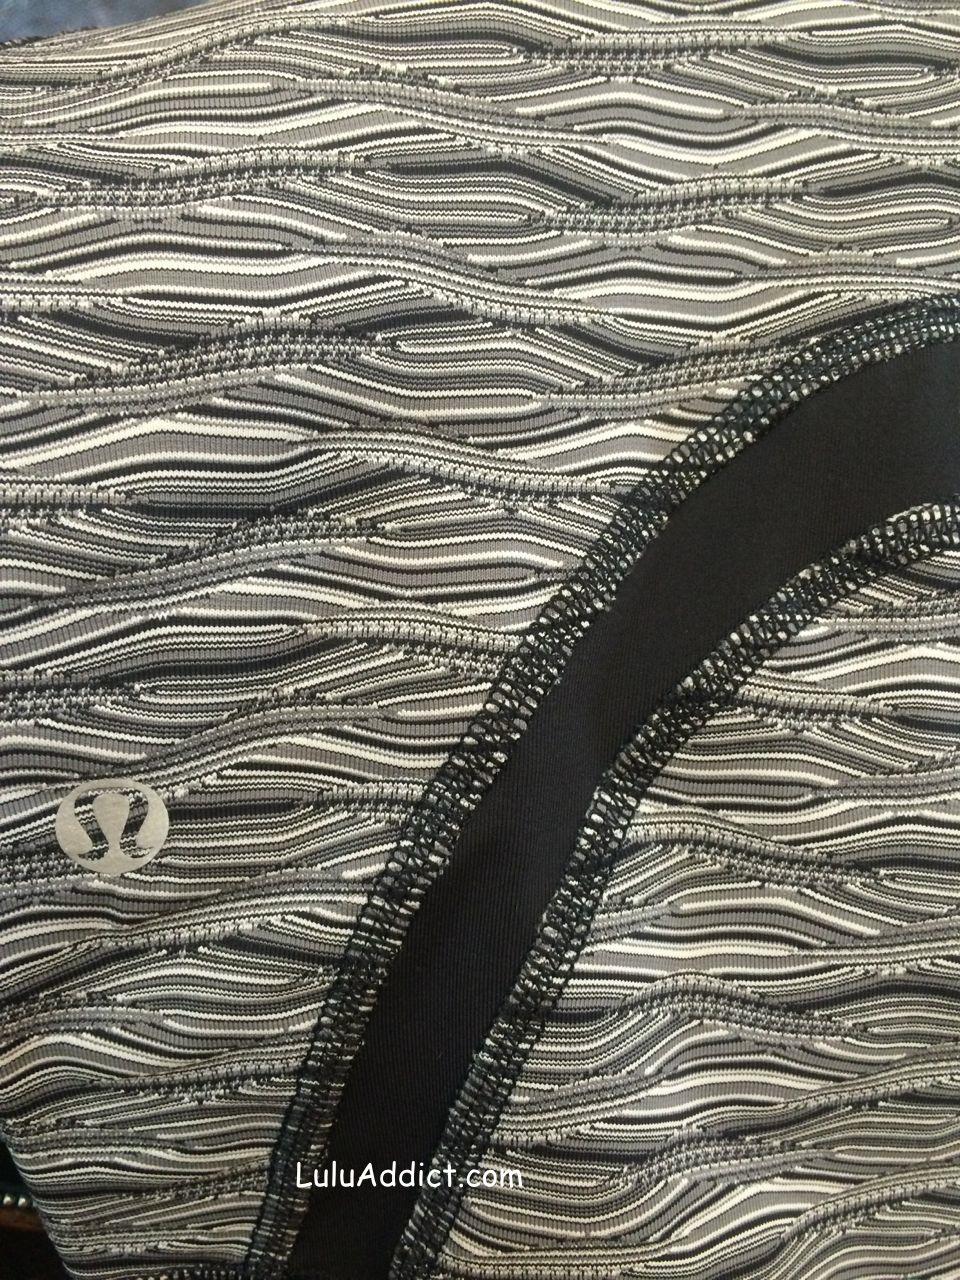 lululemon textured wave inspires